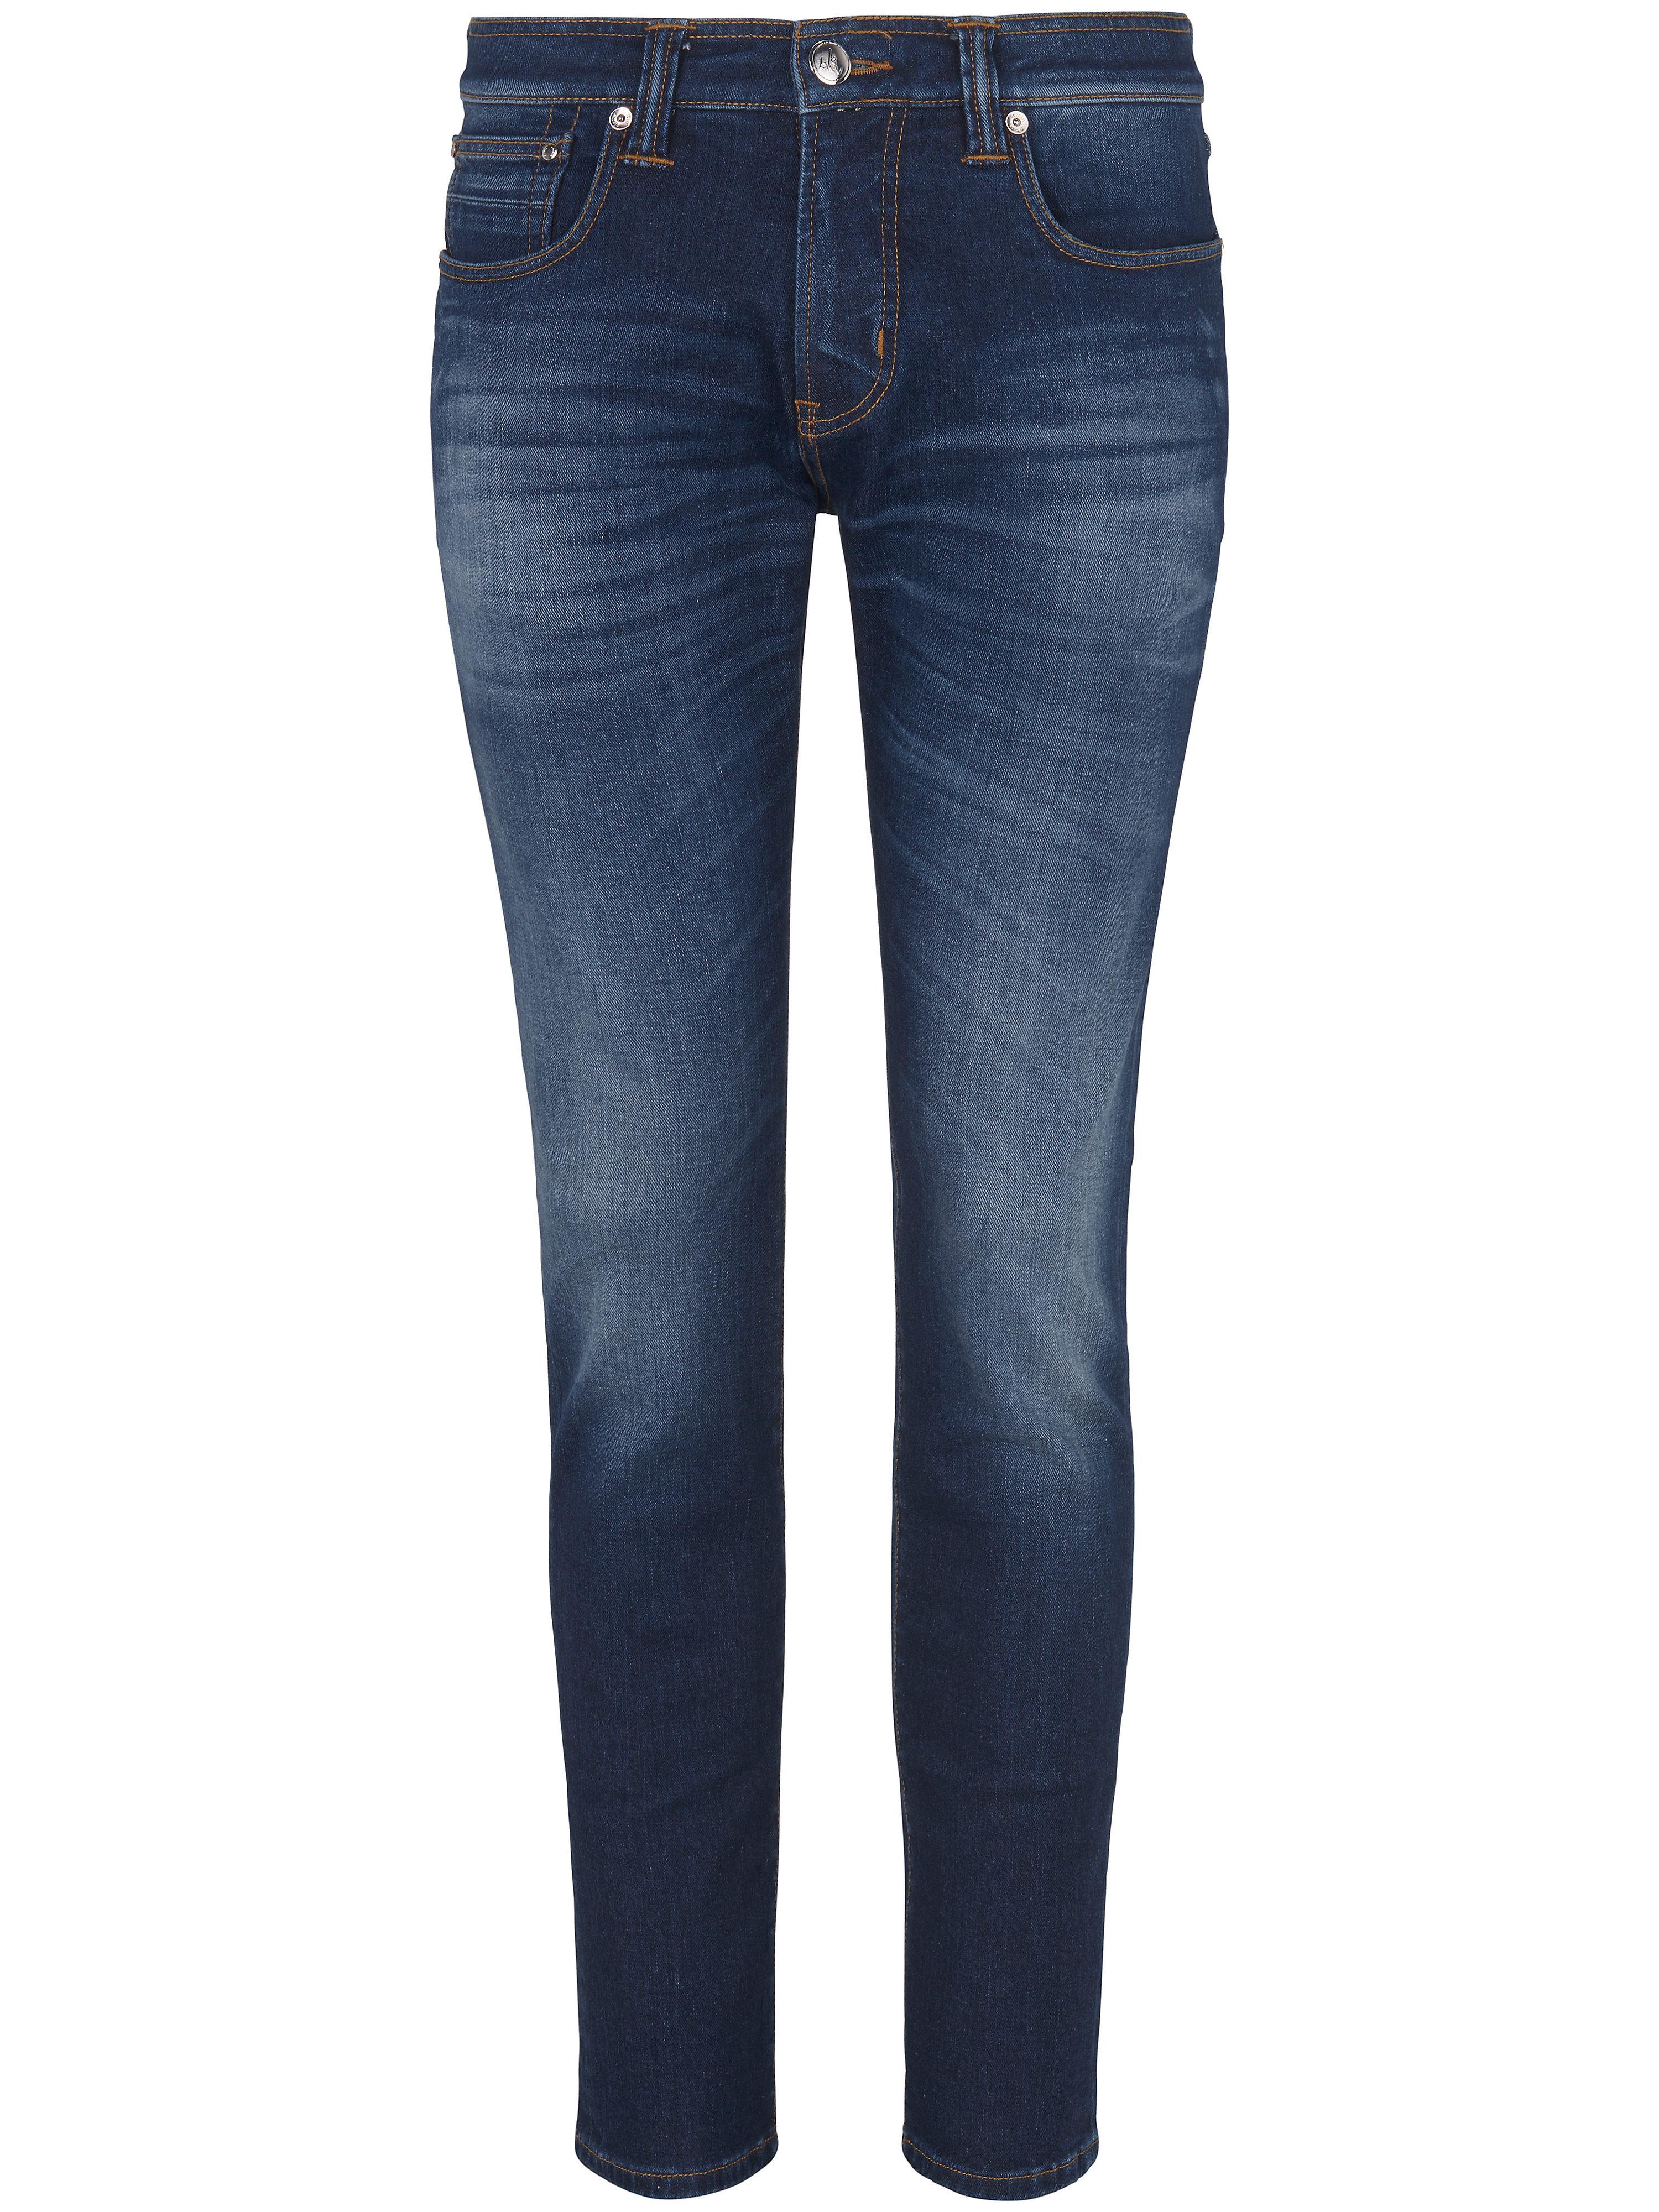 Jeans model Paris Van Pierre Cardin denim